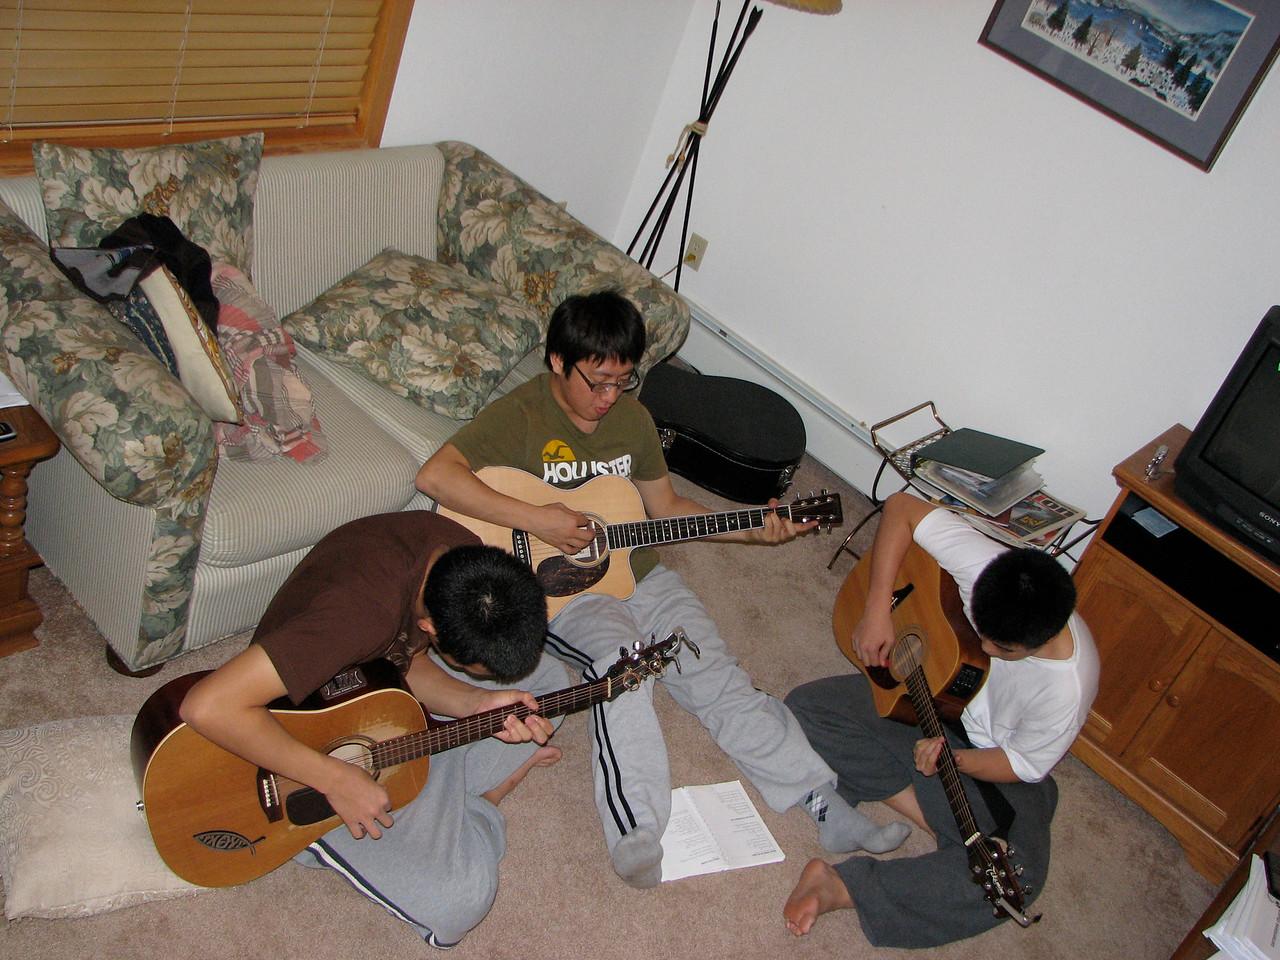 2006 12 22 Fri - Doug Kang, Junghan Kim, & Isaac Chu jamming 2 - with flash